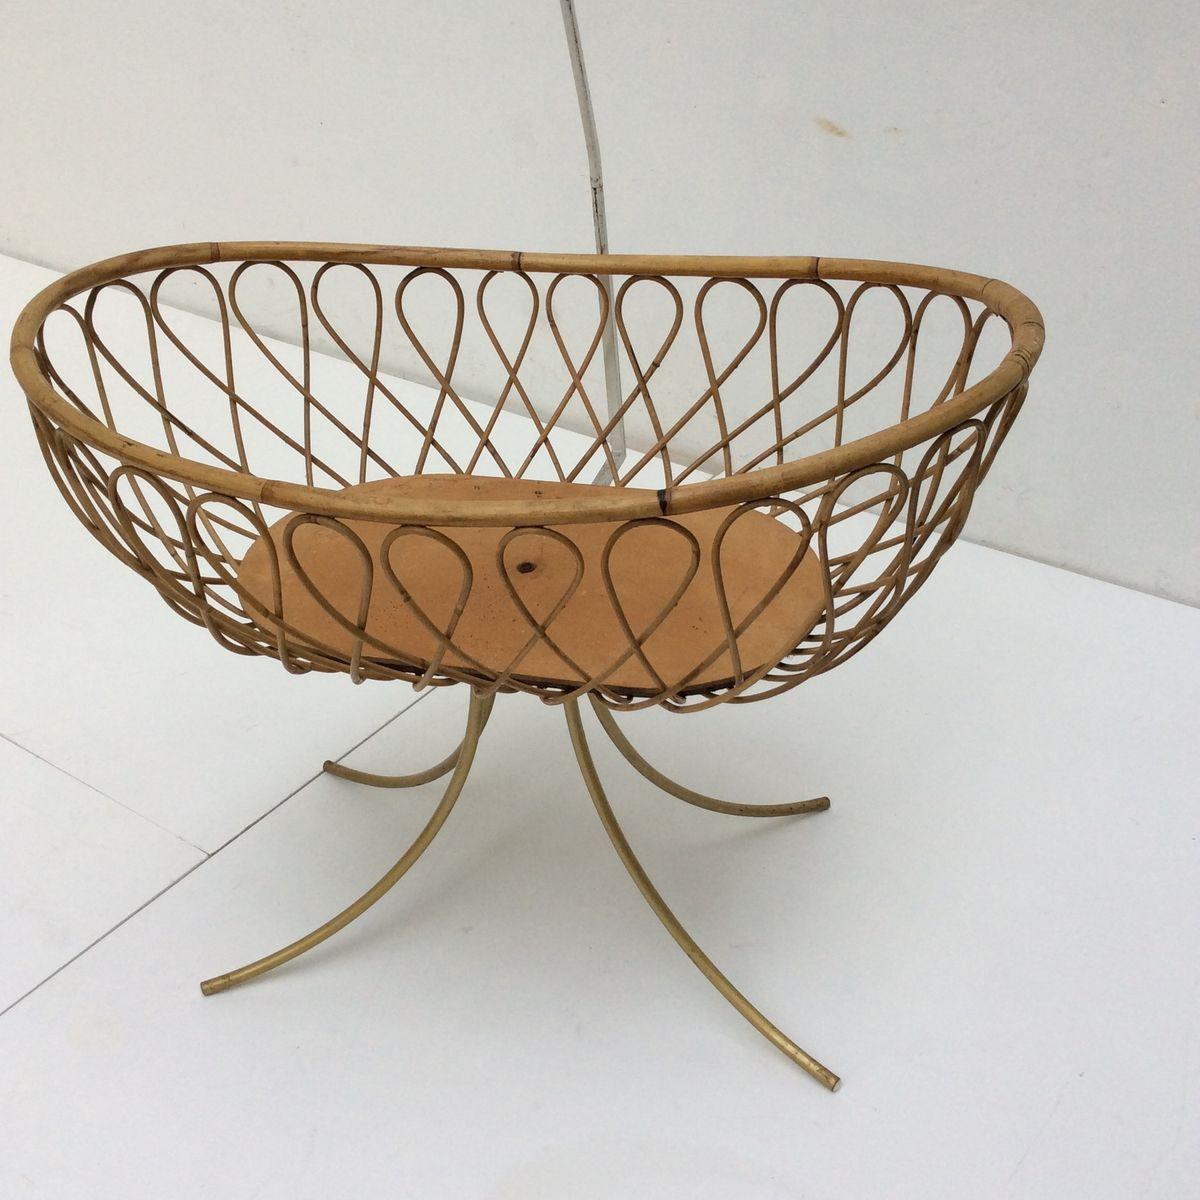 Vintage crib for sale - Vintage Dutch Baby Crib By Rohe Noordwolde 1960s